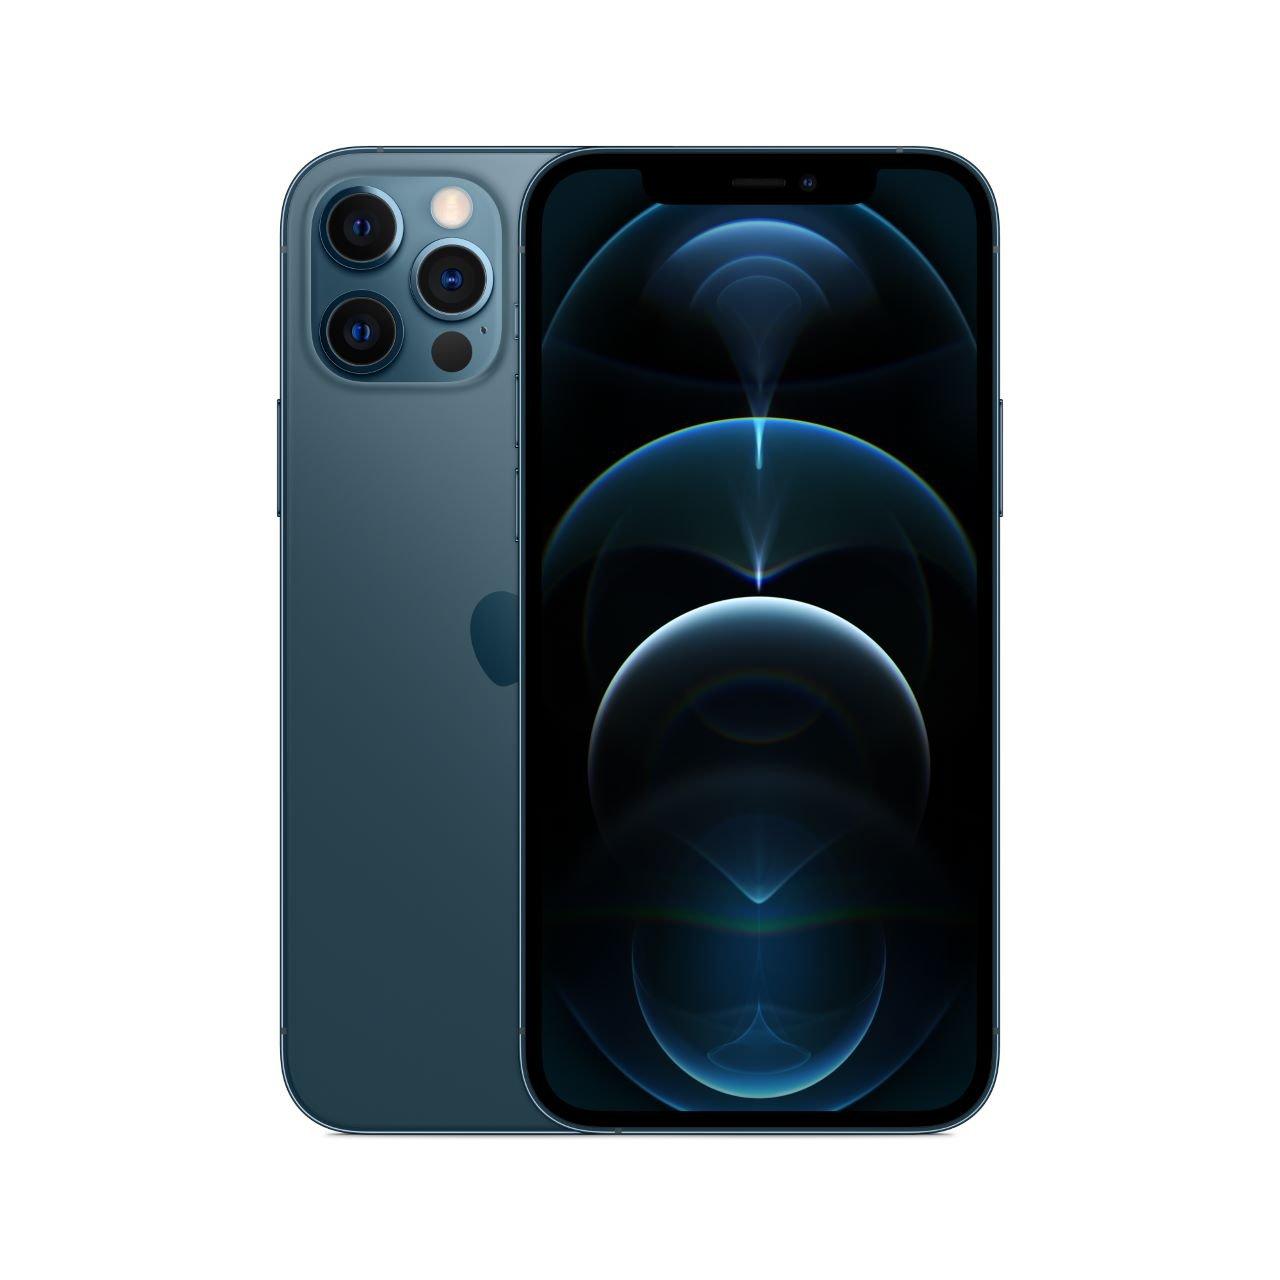 Apple iPhone 12 Pro Pazifikblau 512 GB MGMX3ZD/A